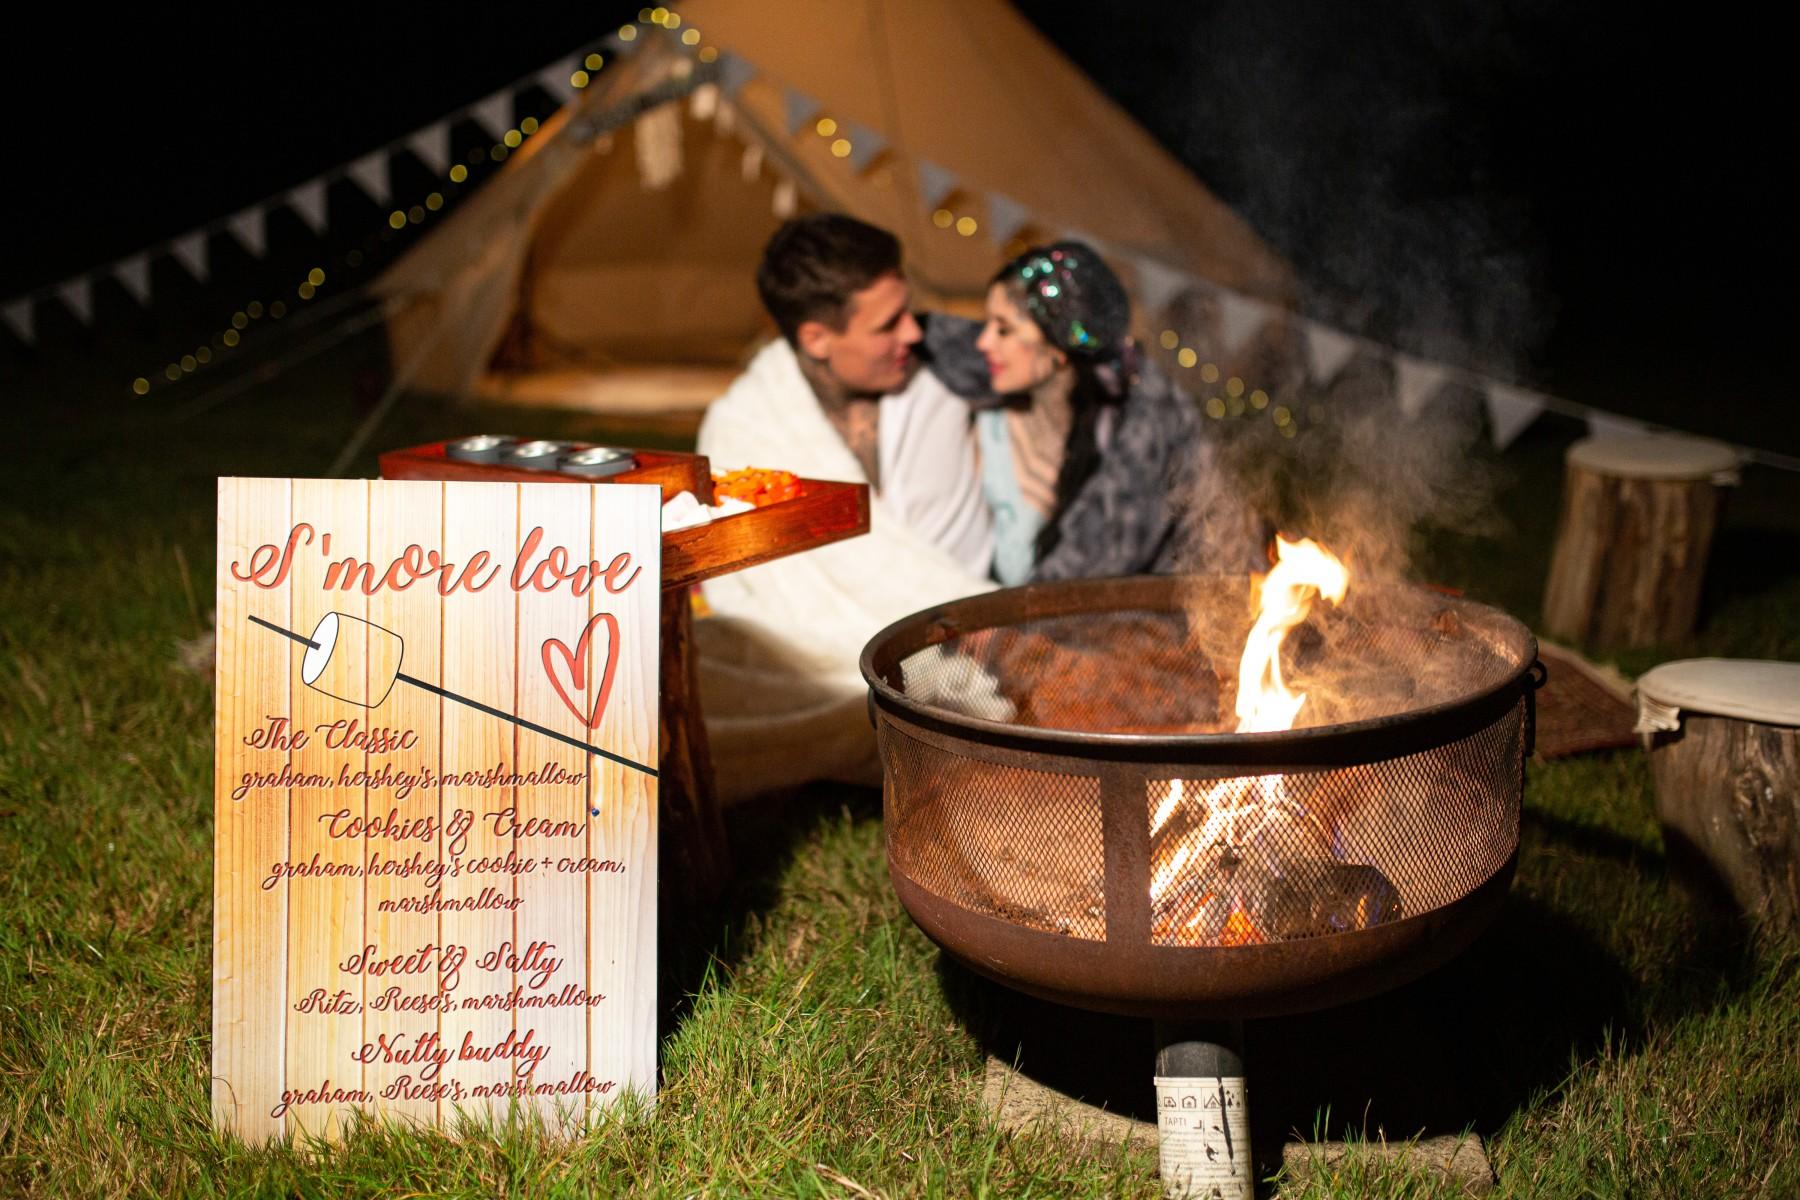 festiva weddingl - bride and groom by campfire with smores